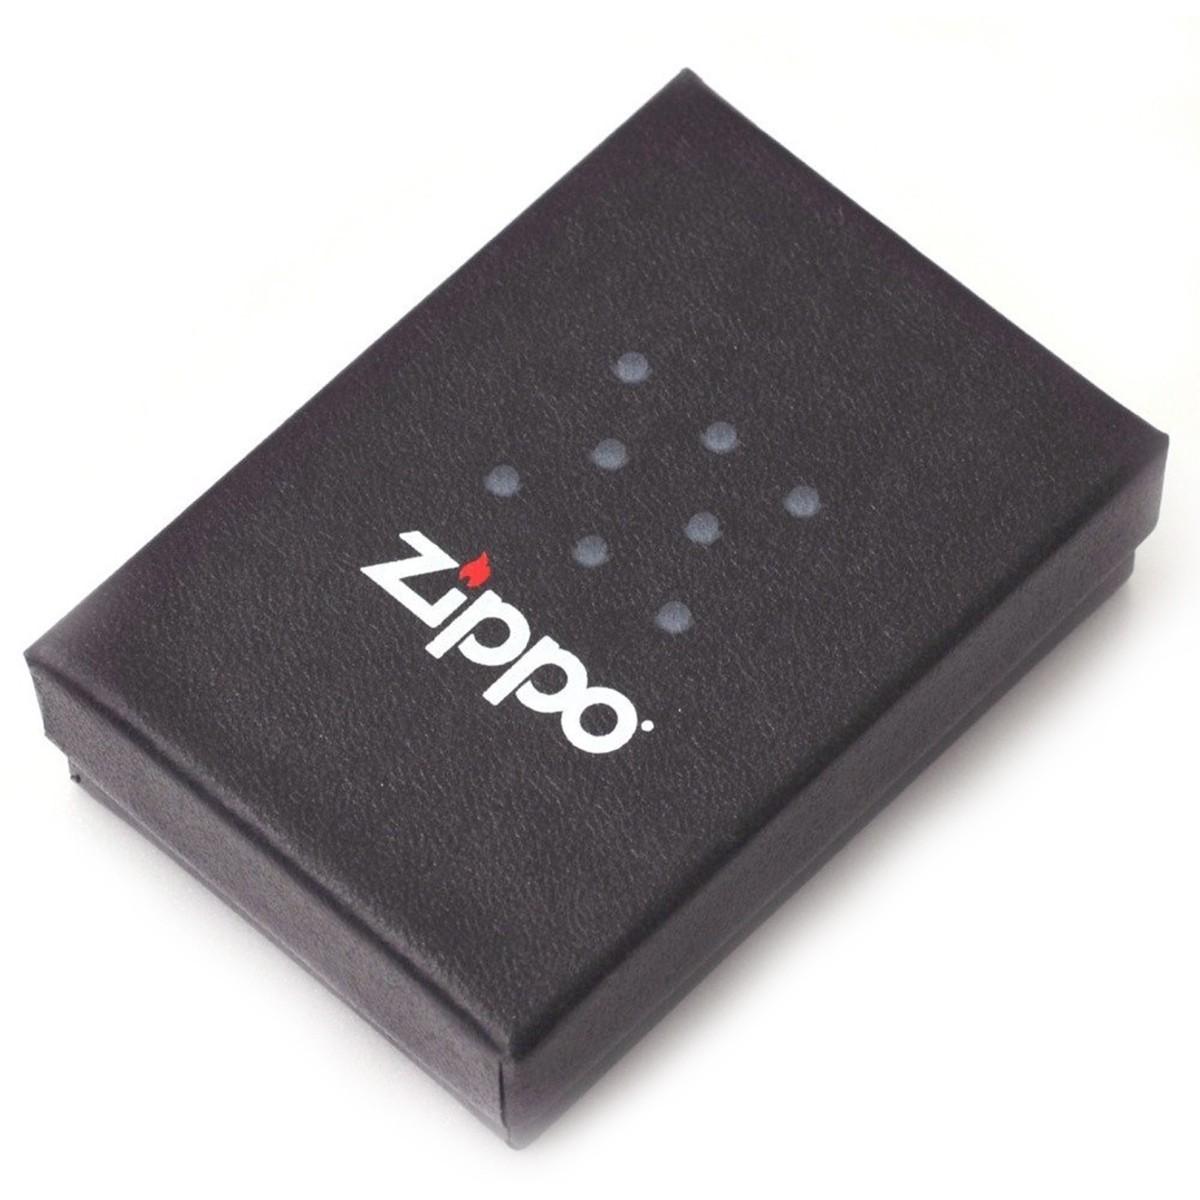 Encendedor Zippo Stamp Kurt Cobain Profile 29051 Matte Cream .